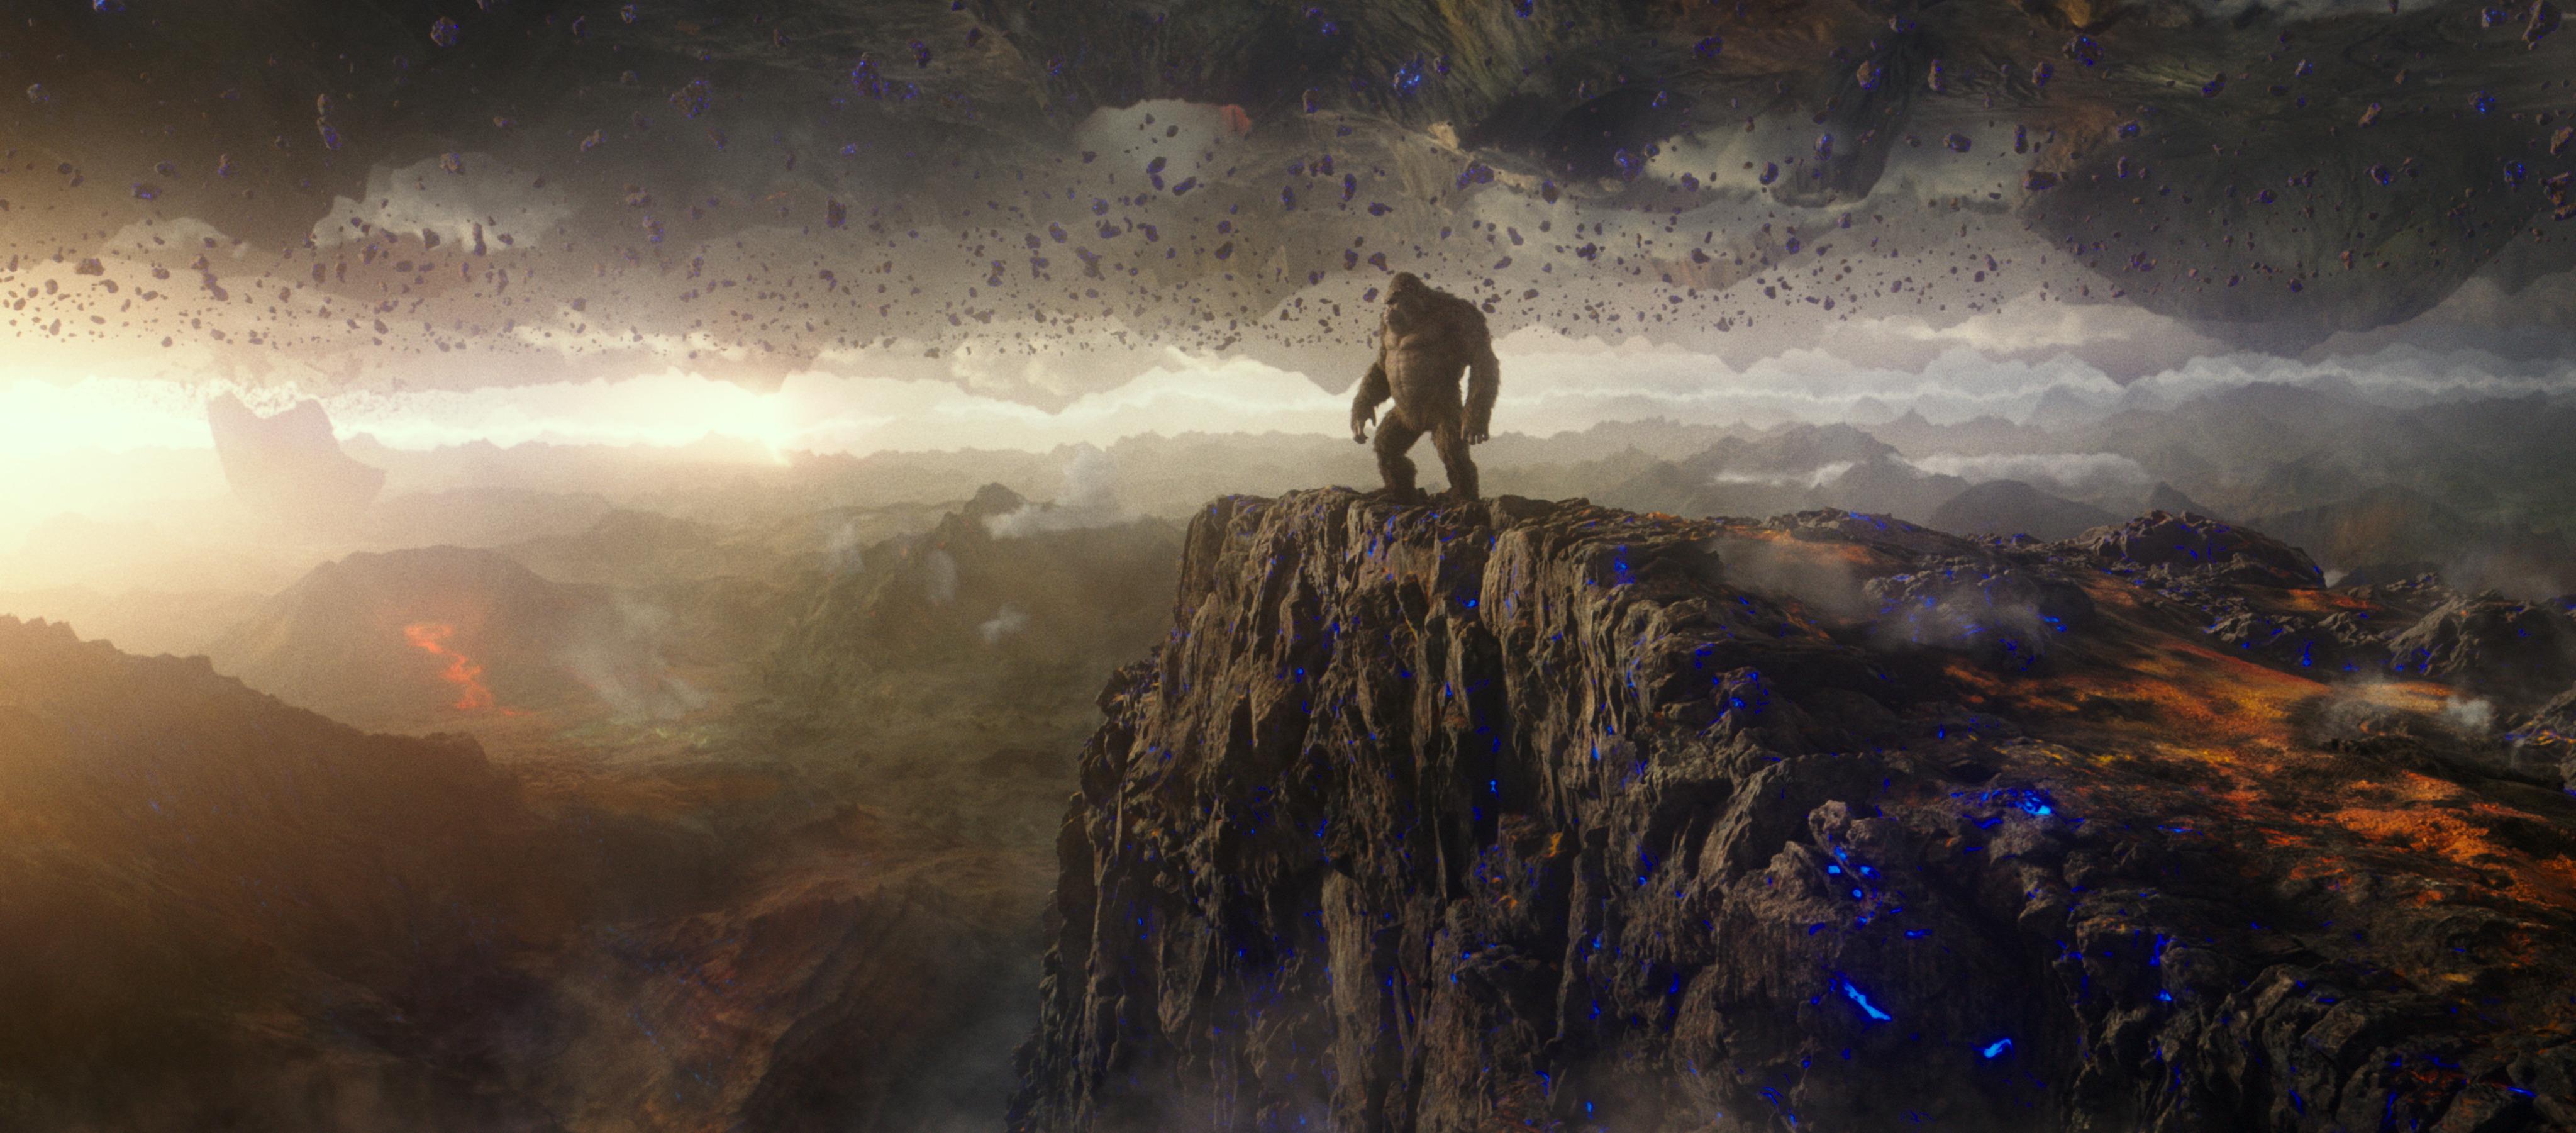 godzilla vs kong still 2021 4k 1618166983 - Godzilla Vs Kong Still 2021 4k - Godzilla Vs Kong Still 2021 4k wallpapers